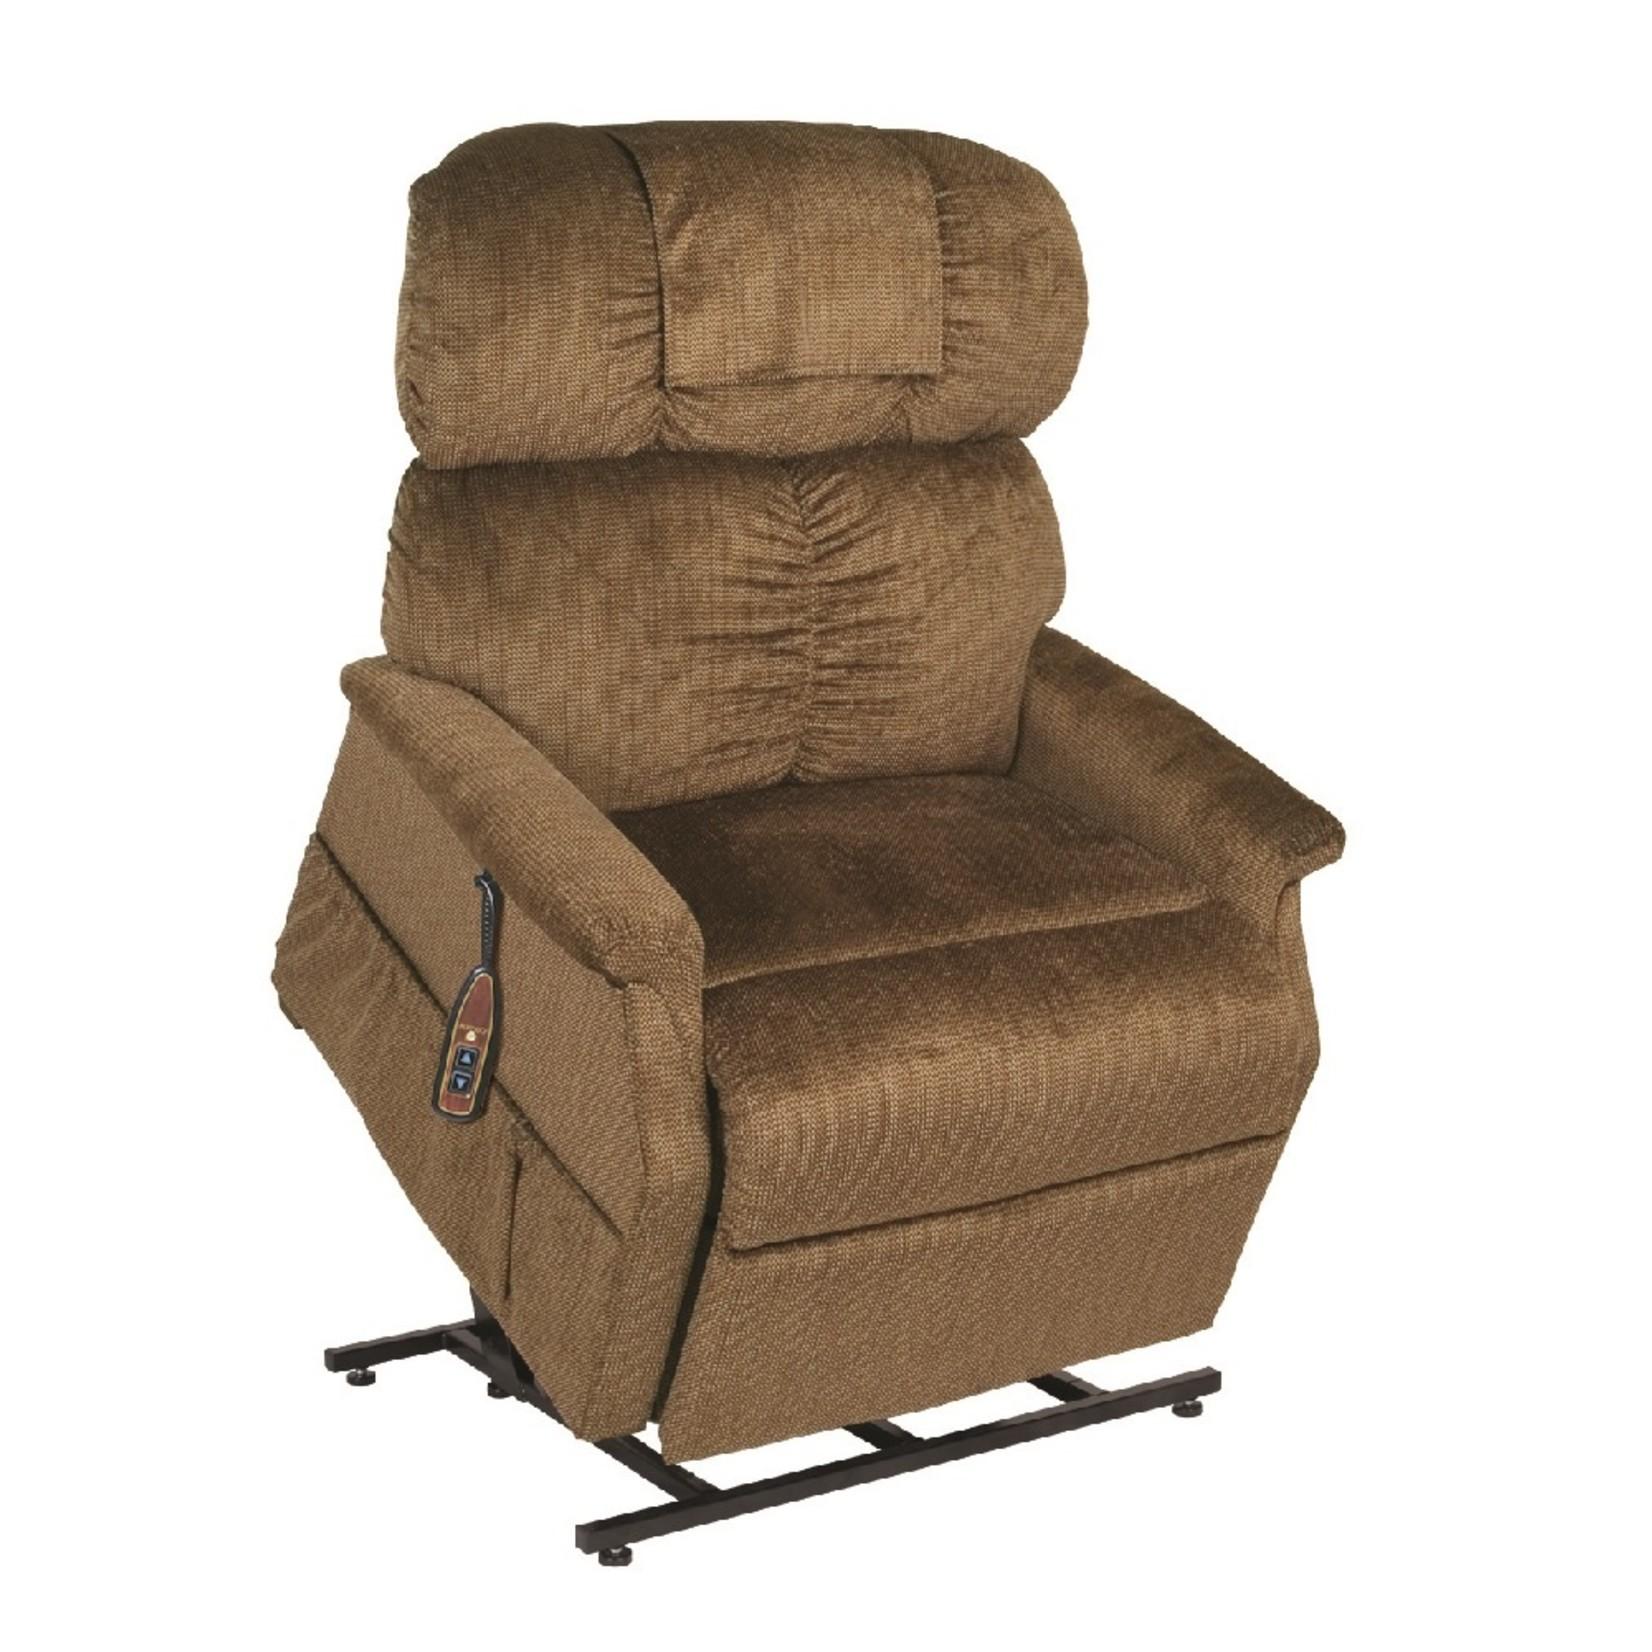 Golden Technologies Comfort Recliner Chair